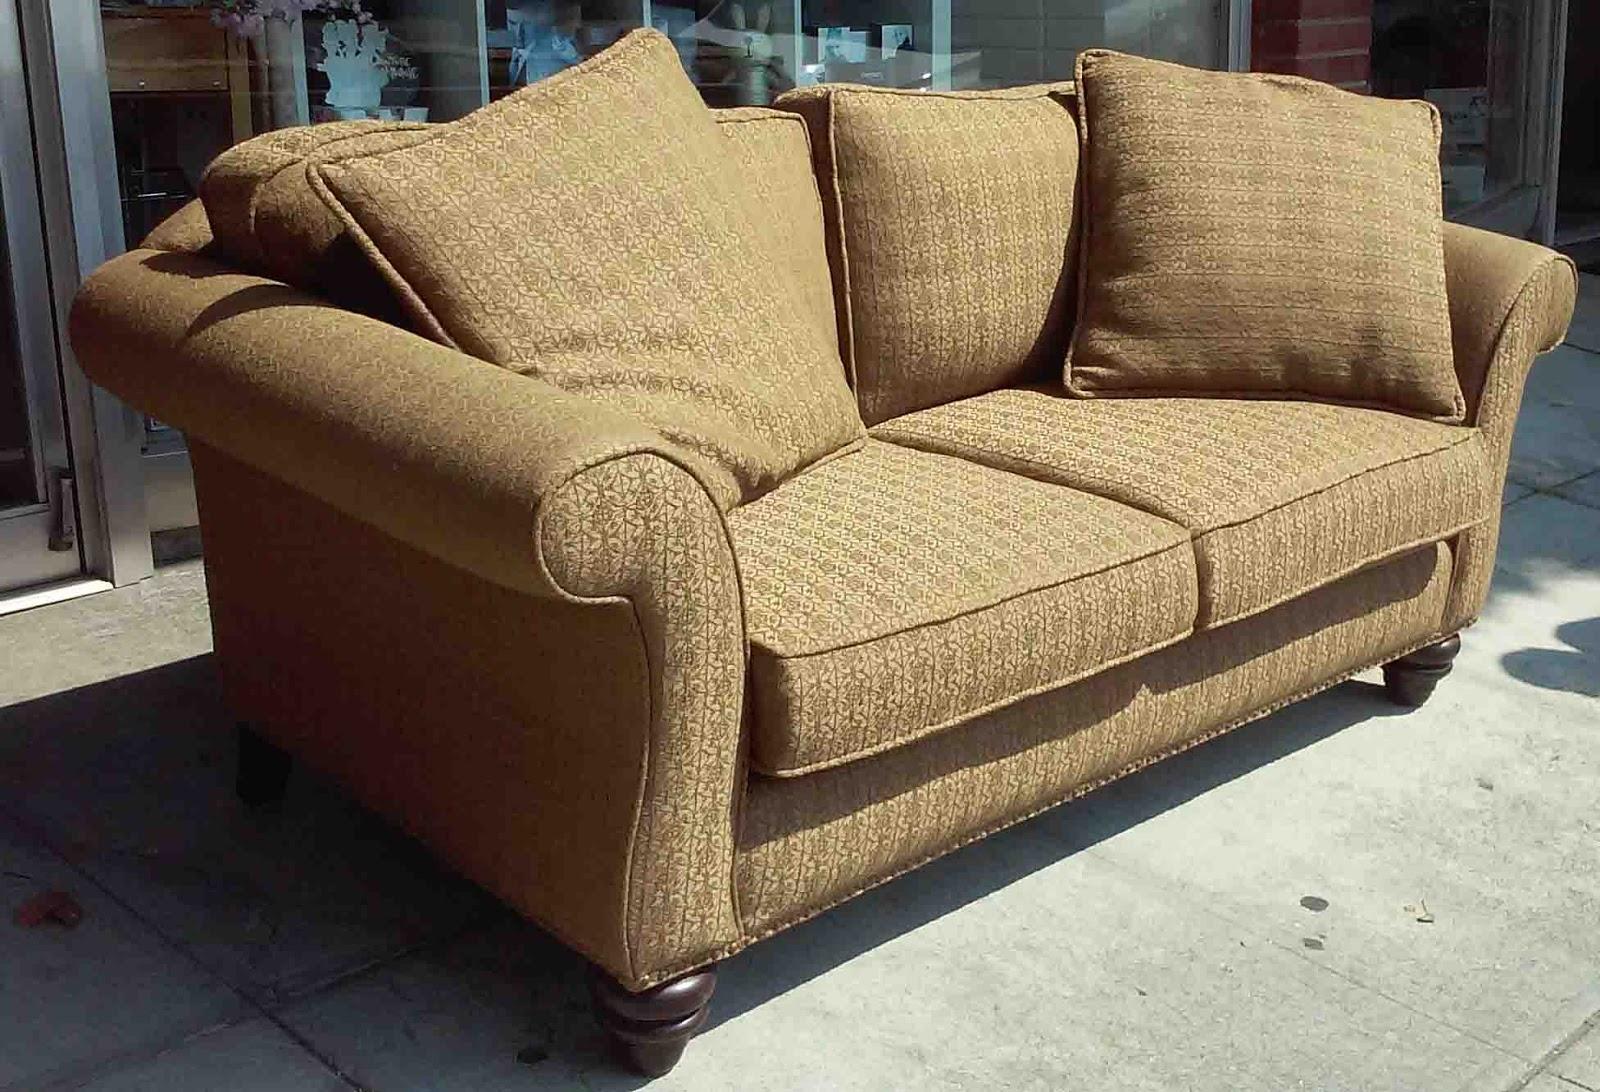 Uhuru furniture collectibles sold reduced bernhardt for Reduced furniture